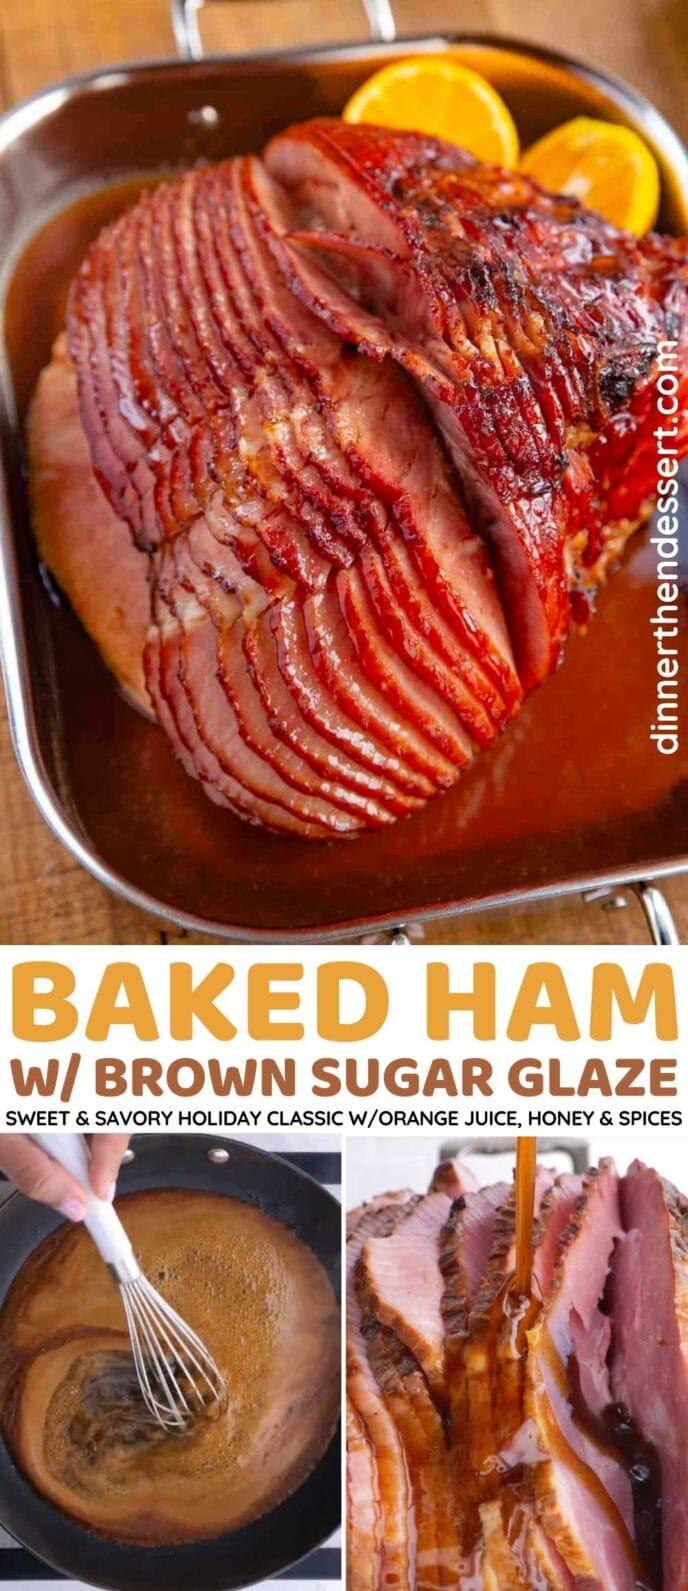 Baked Ham with Brown Sugar Glaze Collage